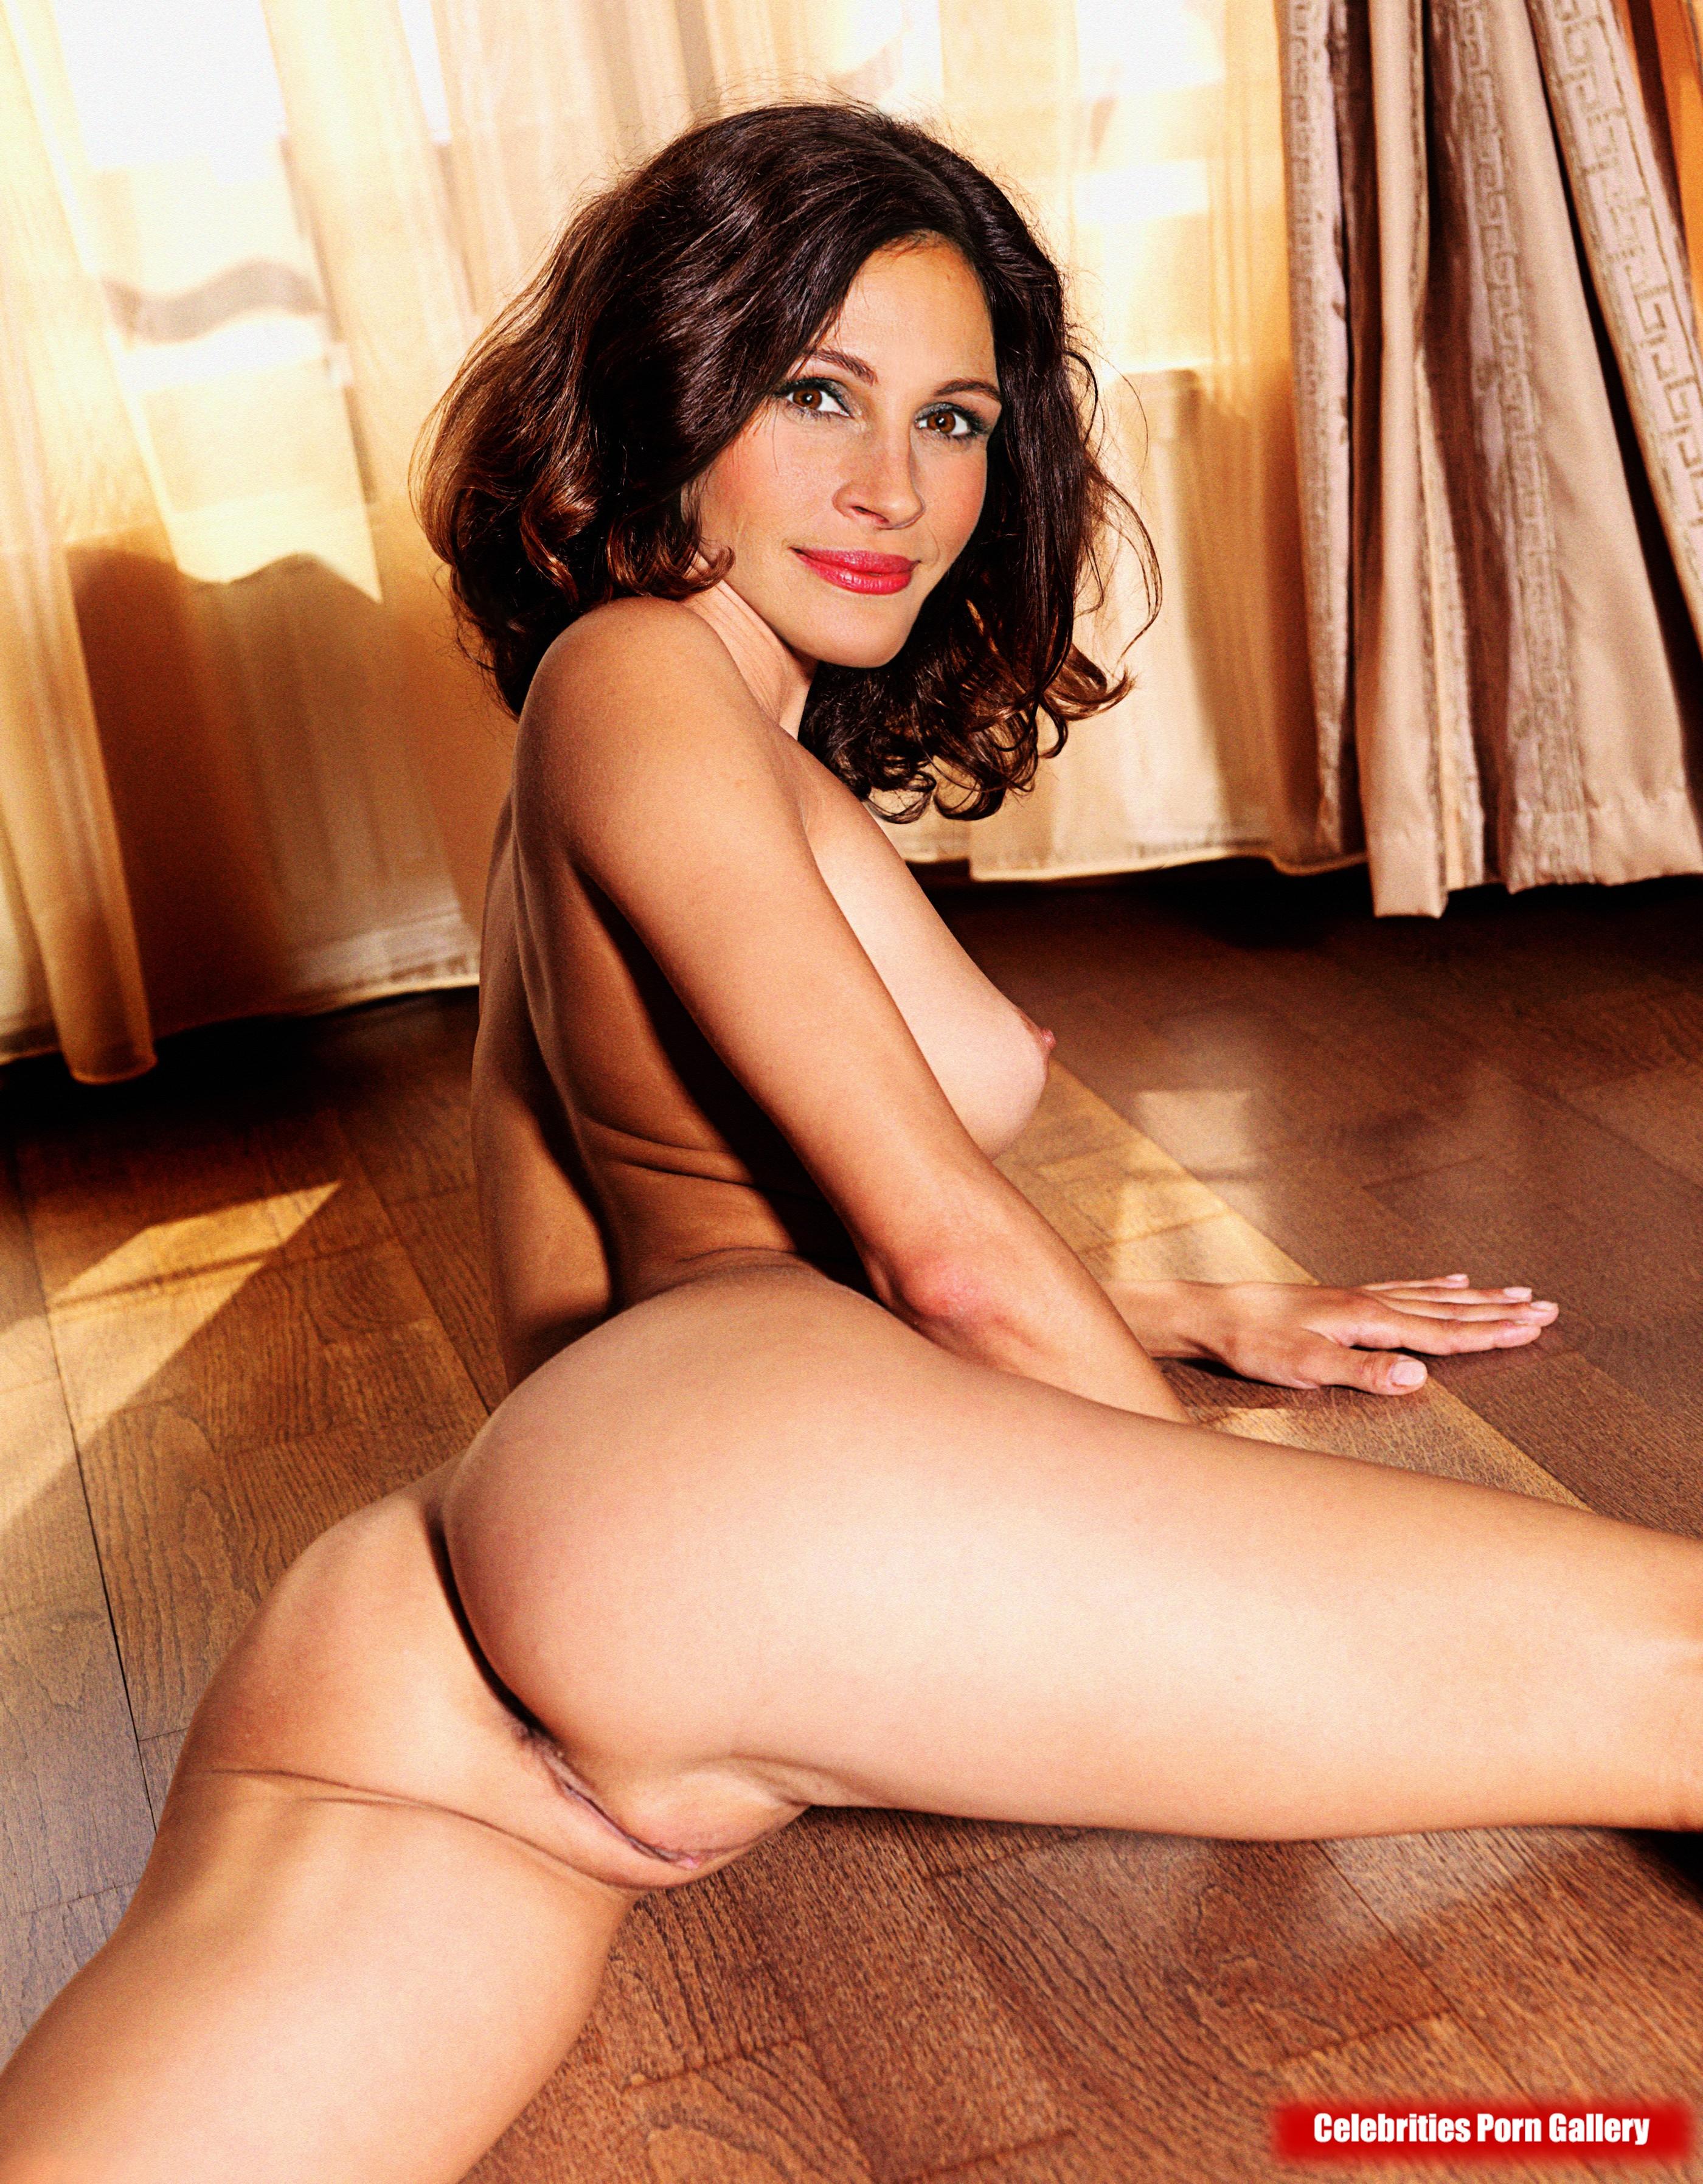 Naked pics john travolta